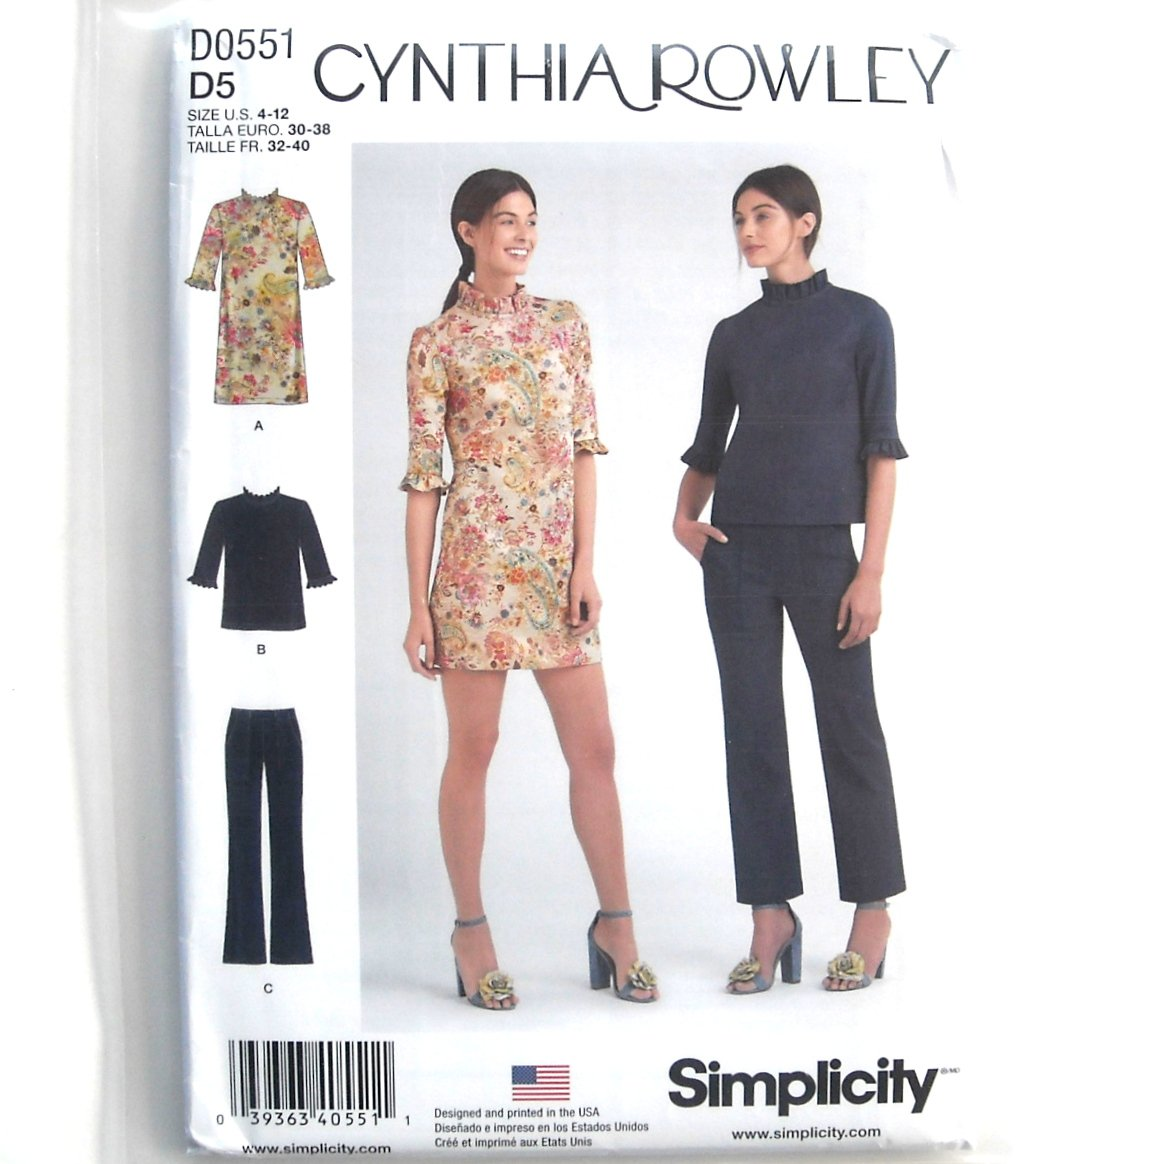 Cynthia Rowley Sewing Patterns: Misses Mini Dress Top Pants 4